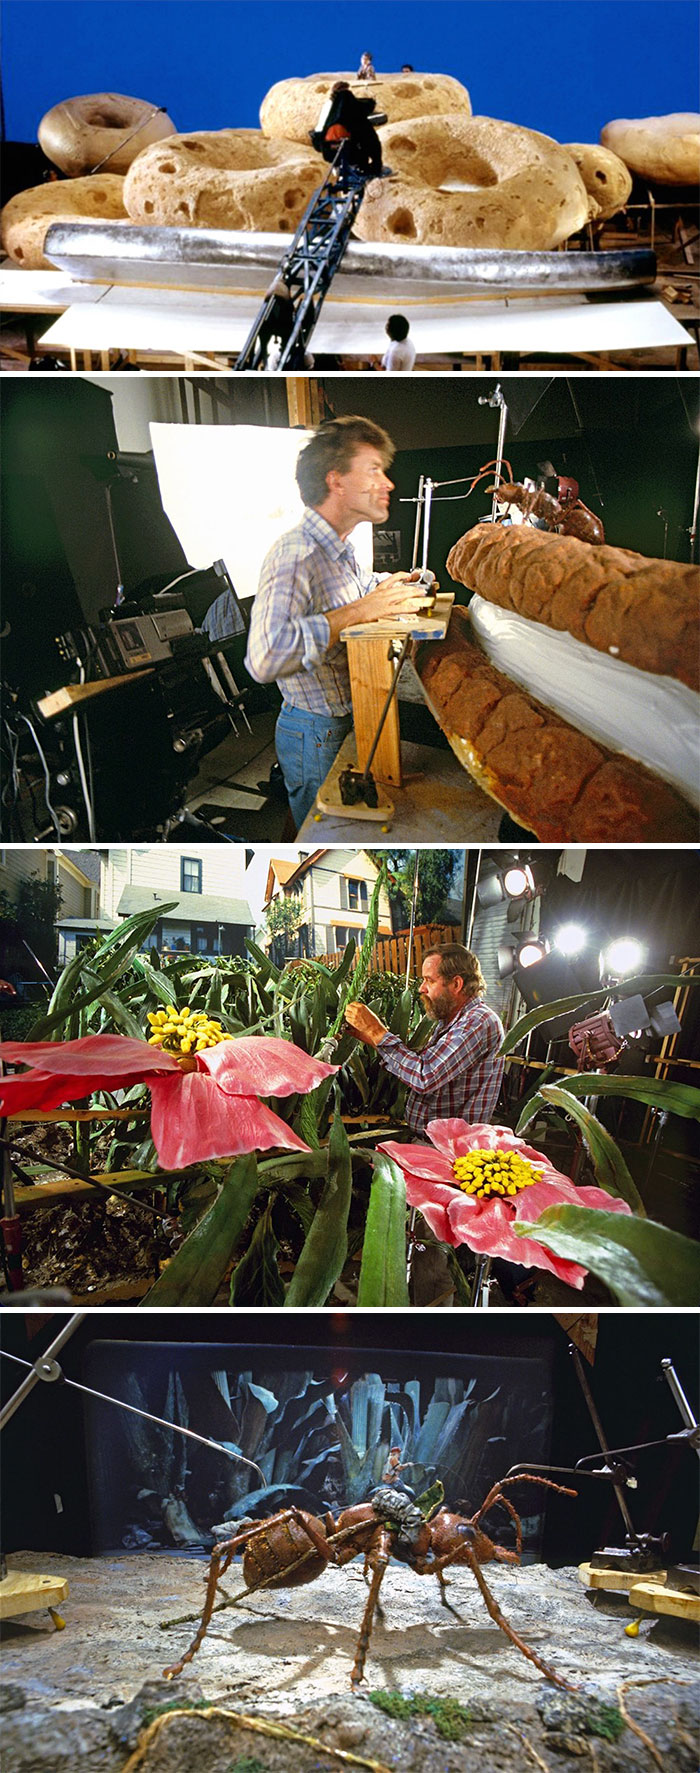 movies behind the scenes 102 5a69a13b3b8d7  700 - Por trás das cenas: Foto dos bastidores de filmes que marcaram época